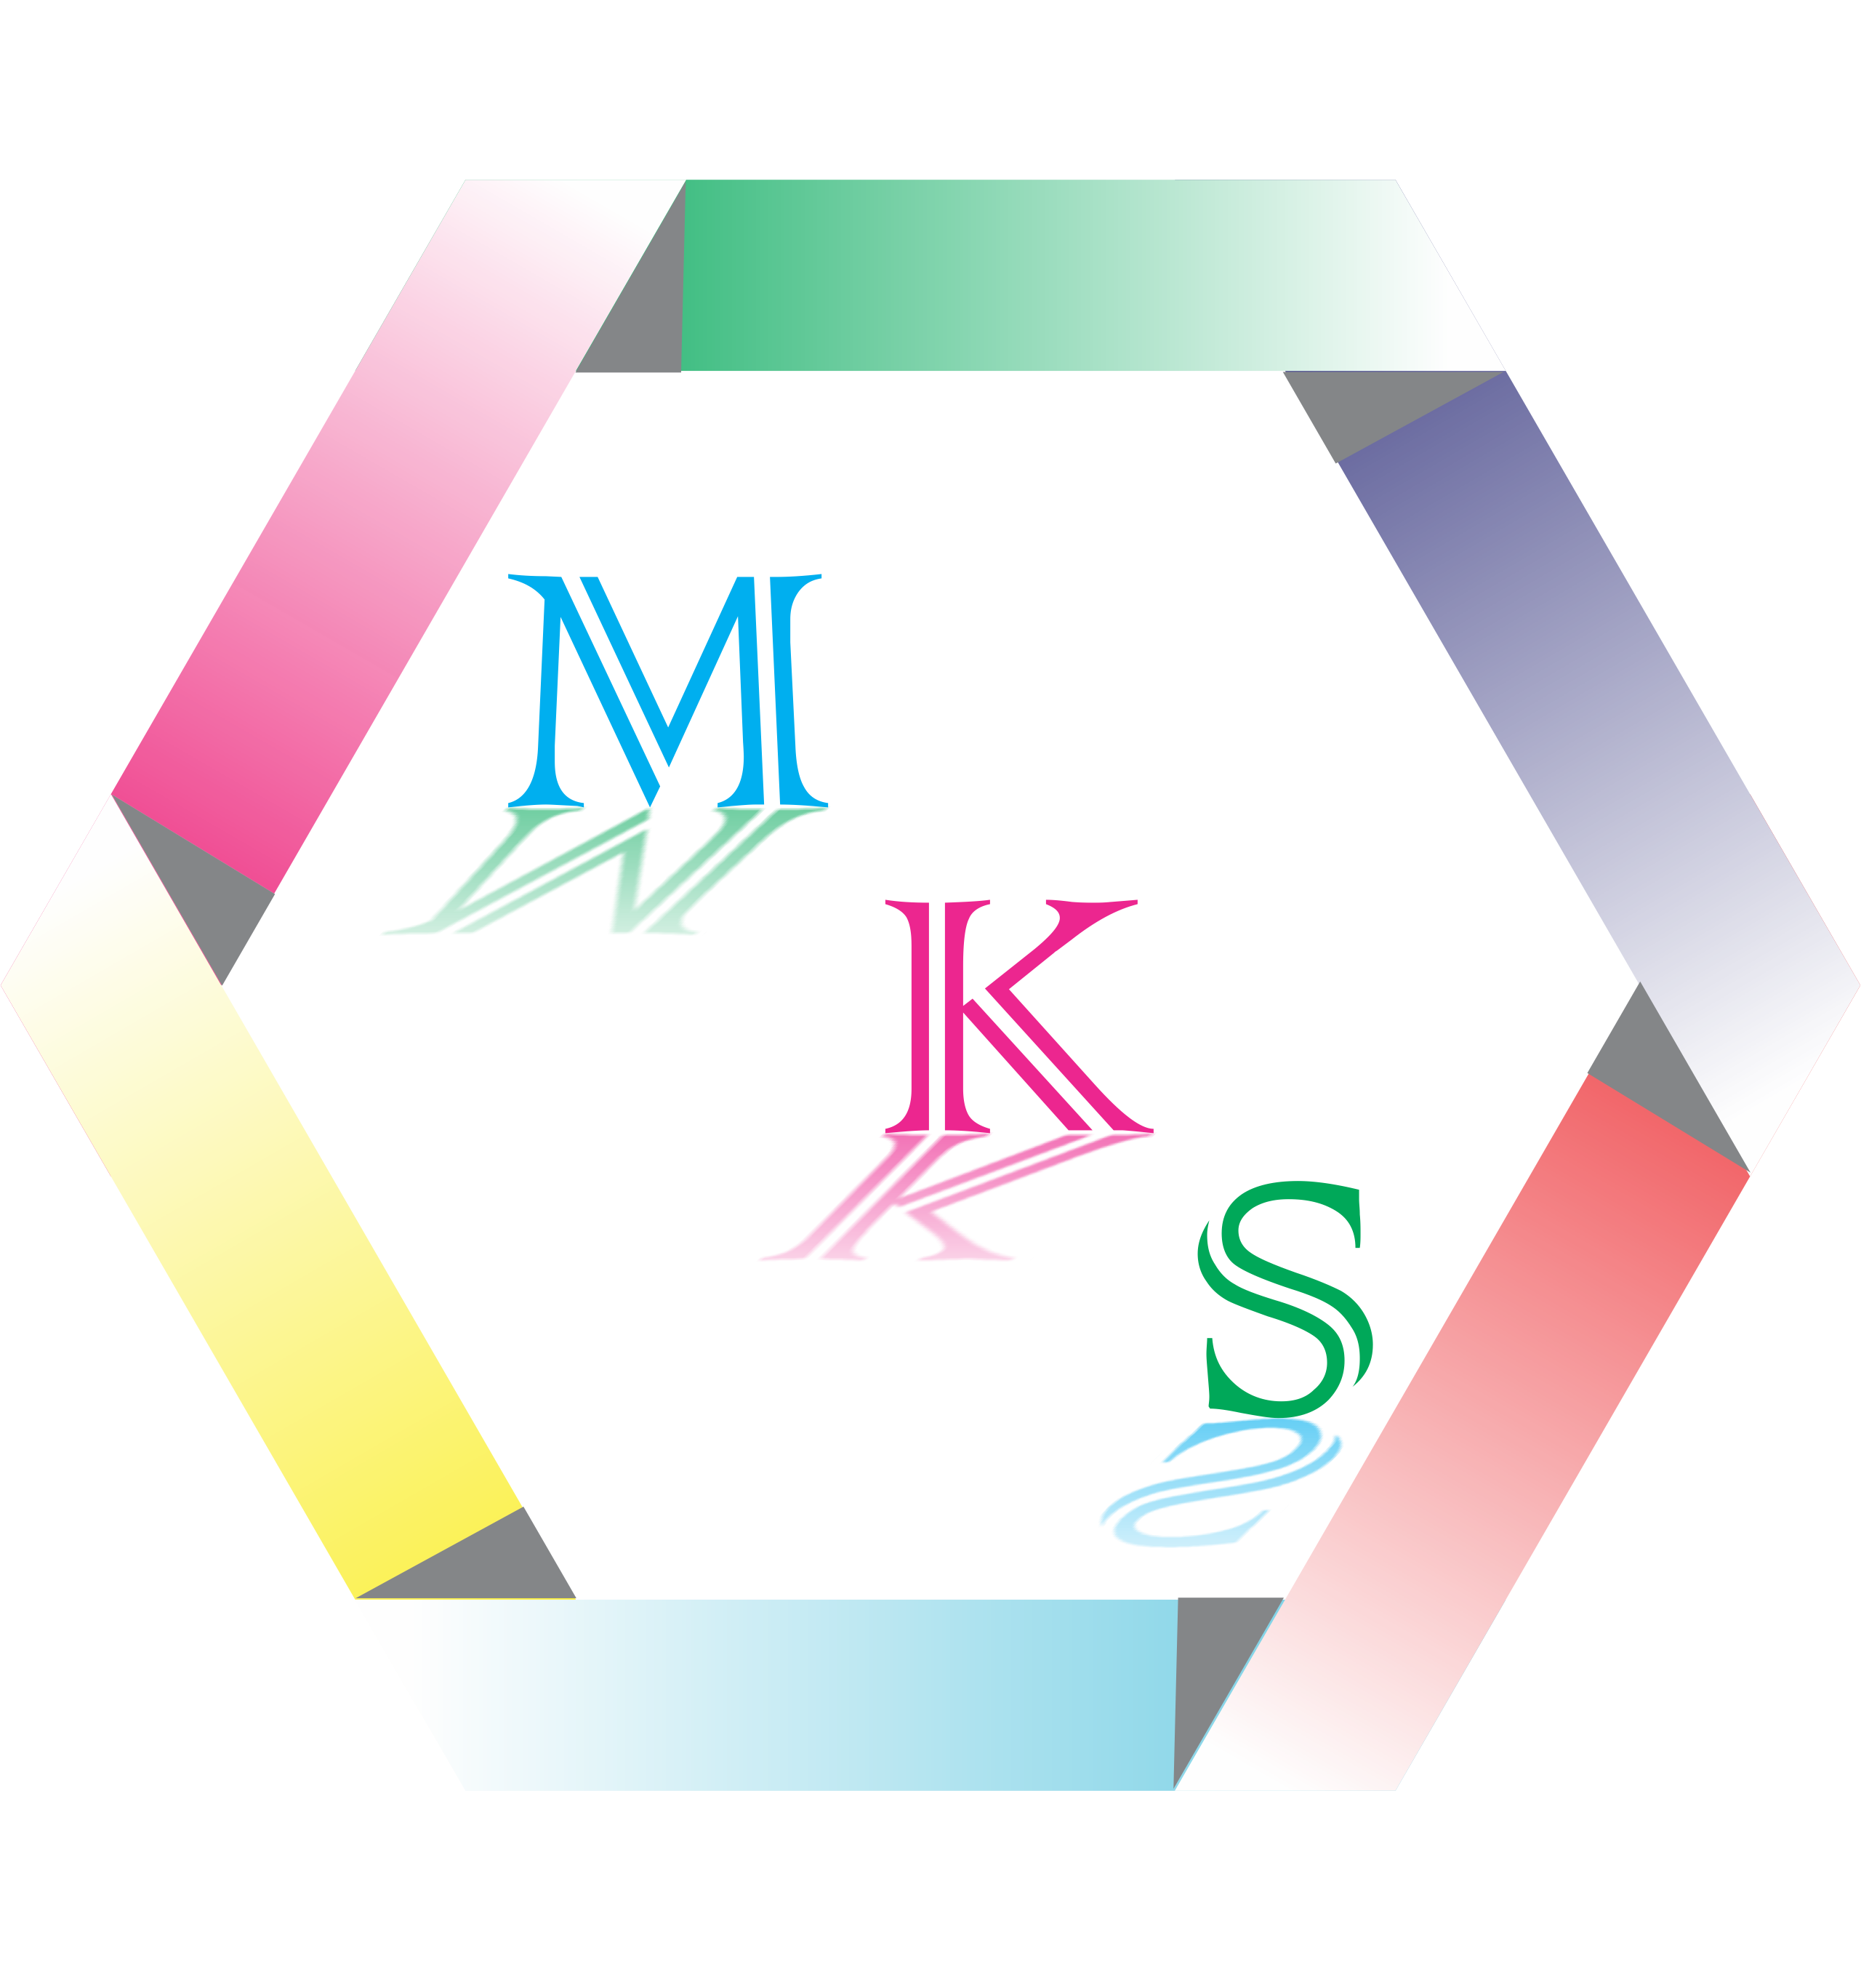 Make MKS 2020 Crack With Full Registration Code [2020] Latest Software